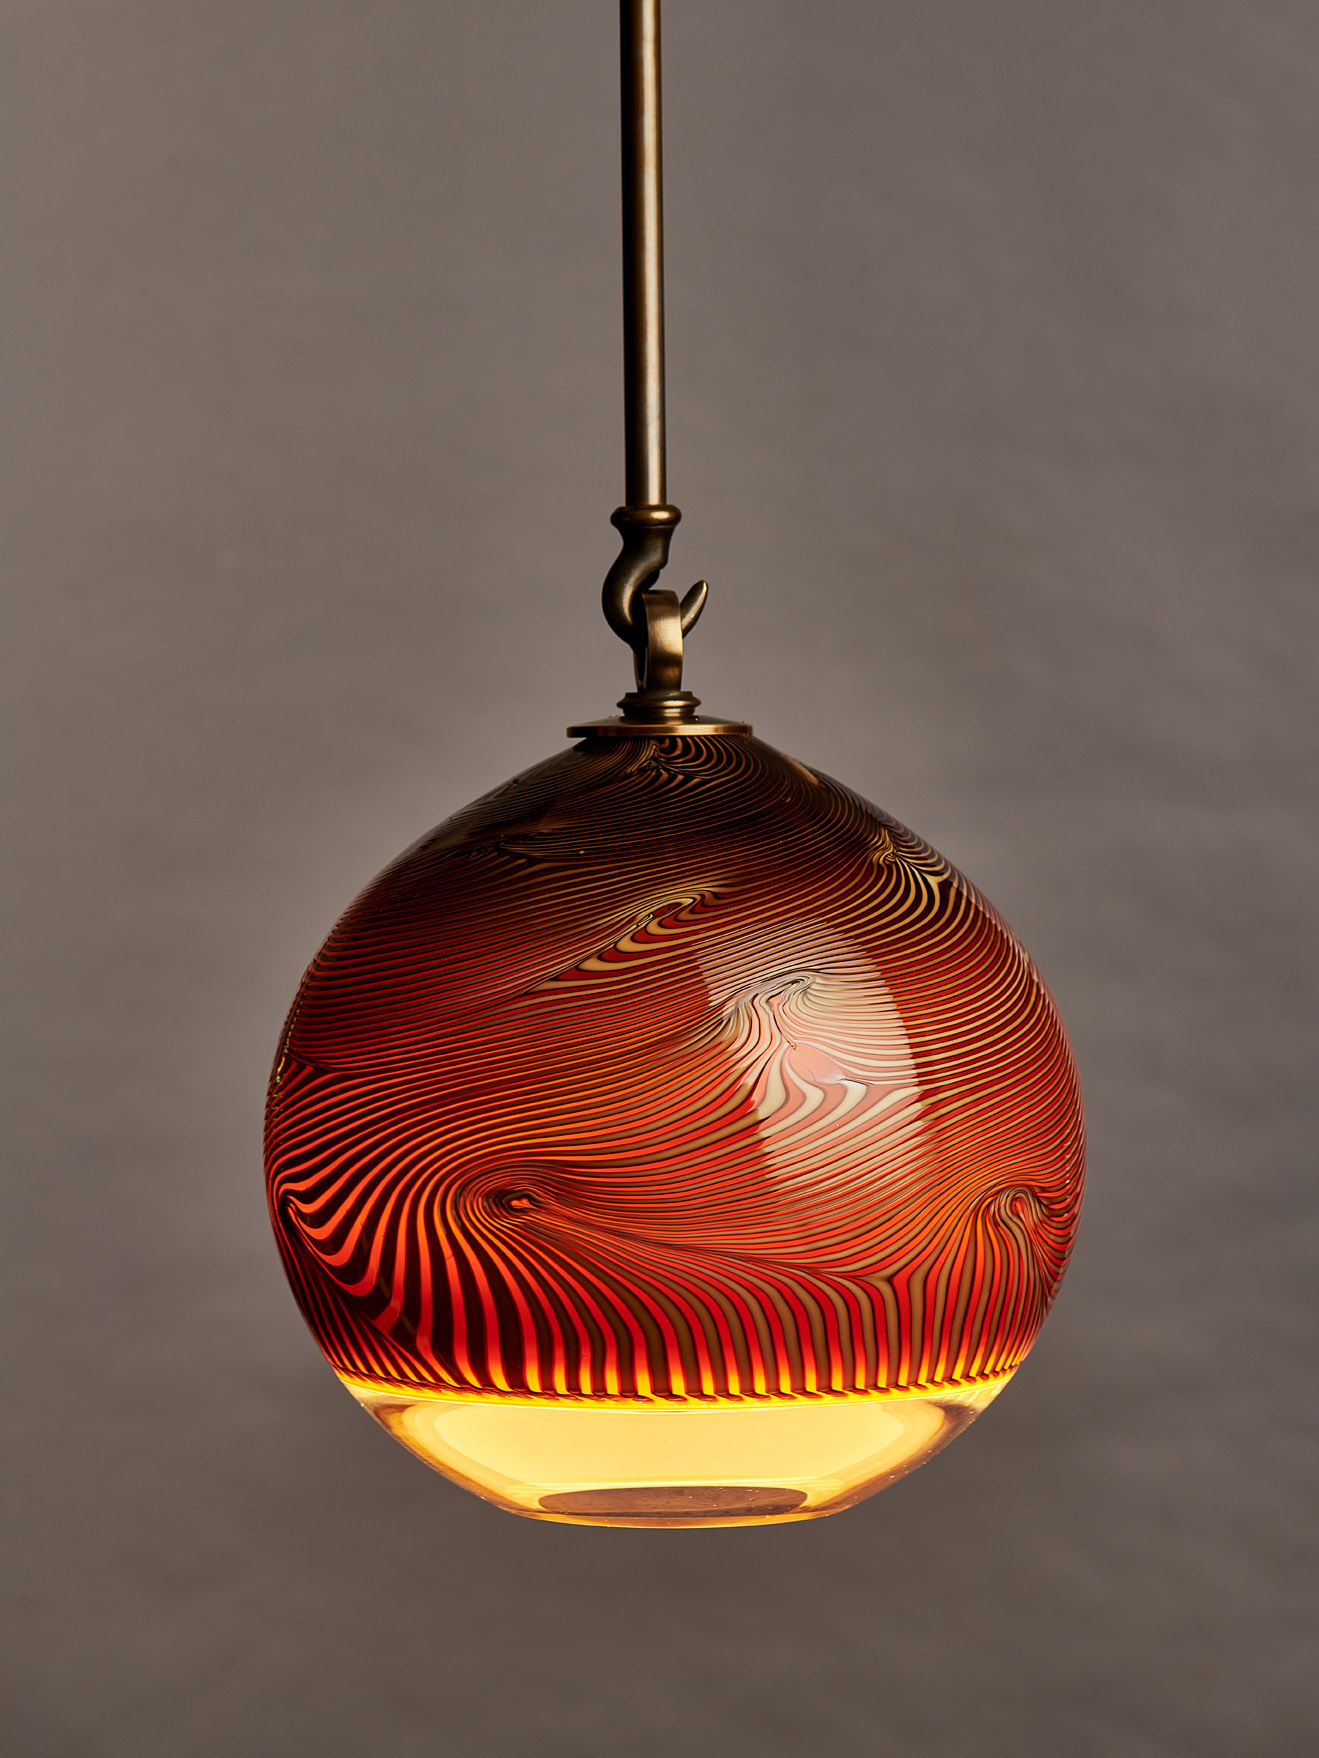 mantis wood grain globe s.jpg